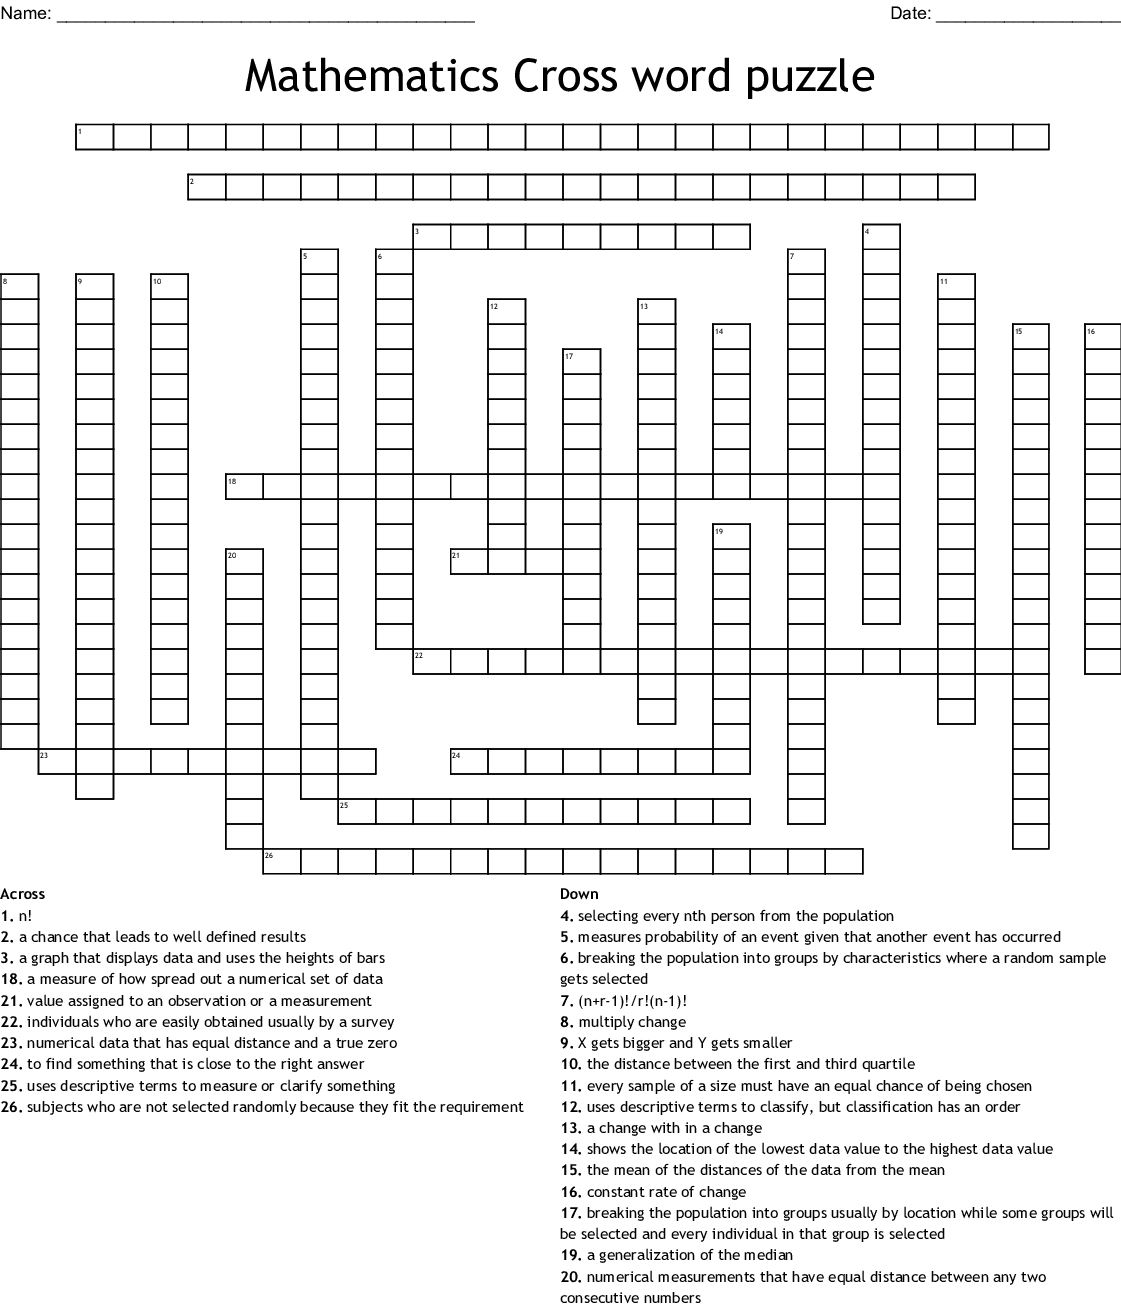 Mathematics Cross Word Puzzle